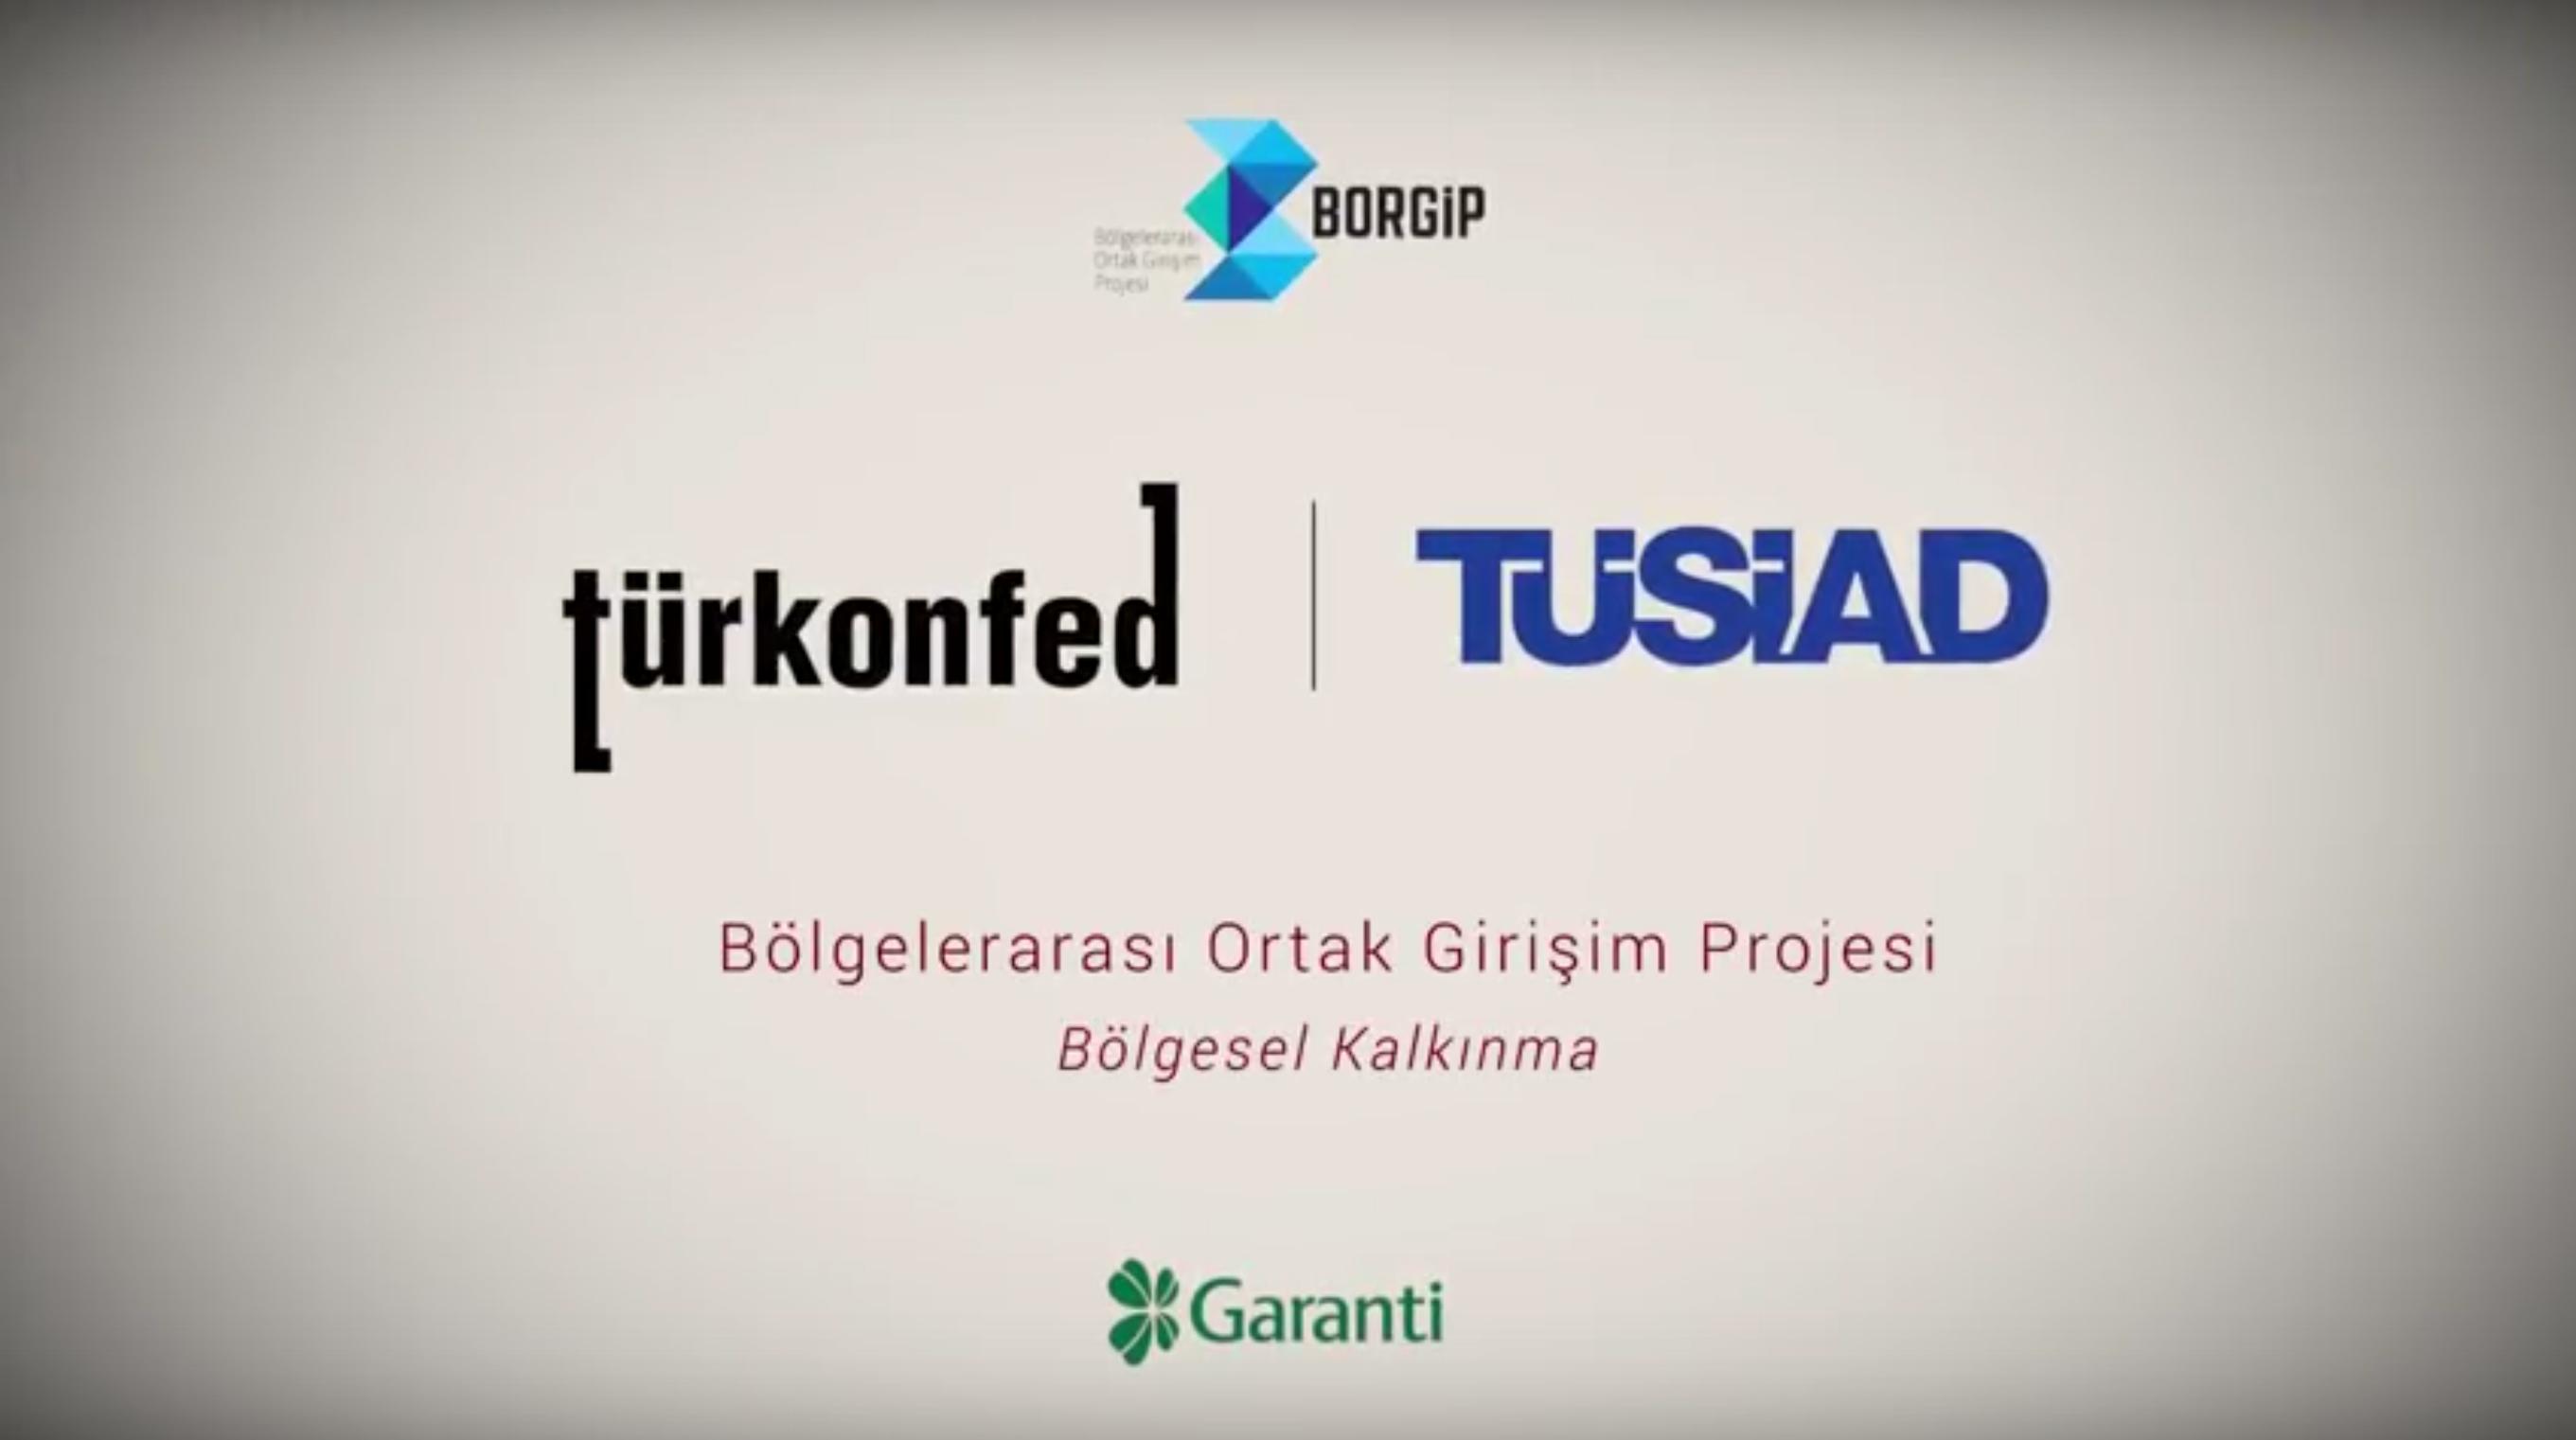 TÜRKONFED-TÜSİAD BORGİP Tanıtım Filmi 1-Bölgesel Kalkınma